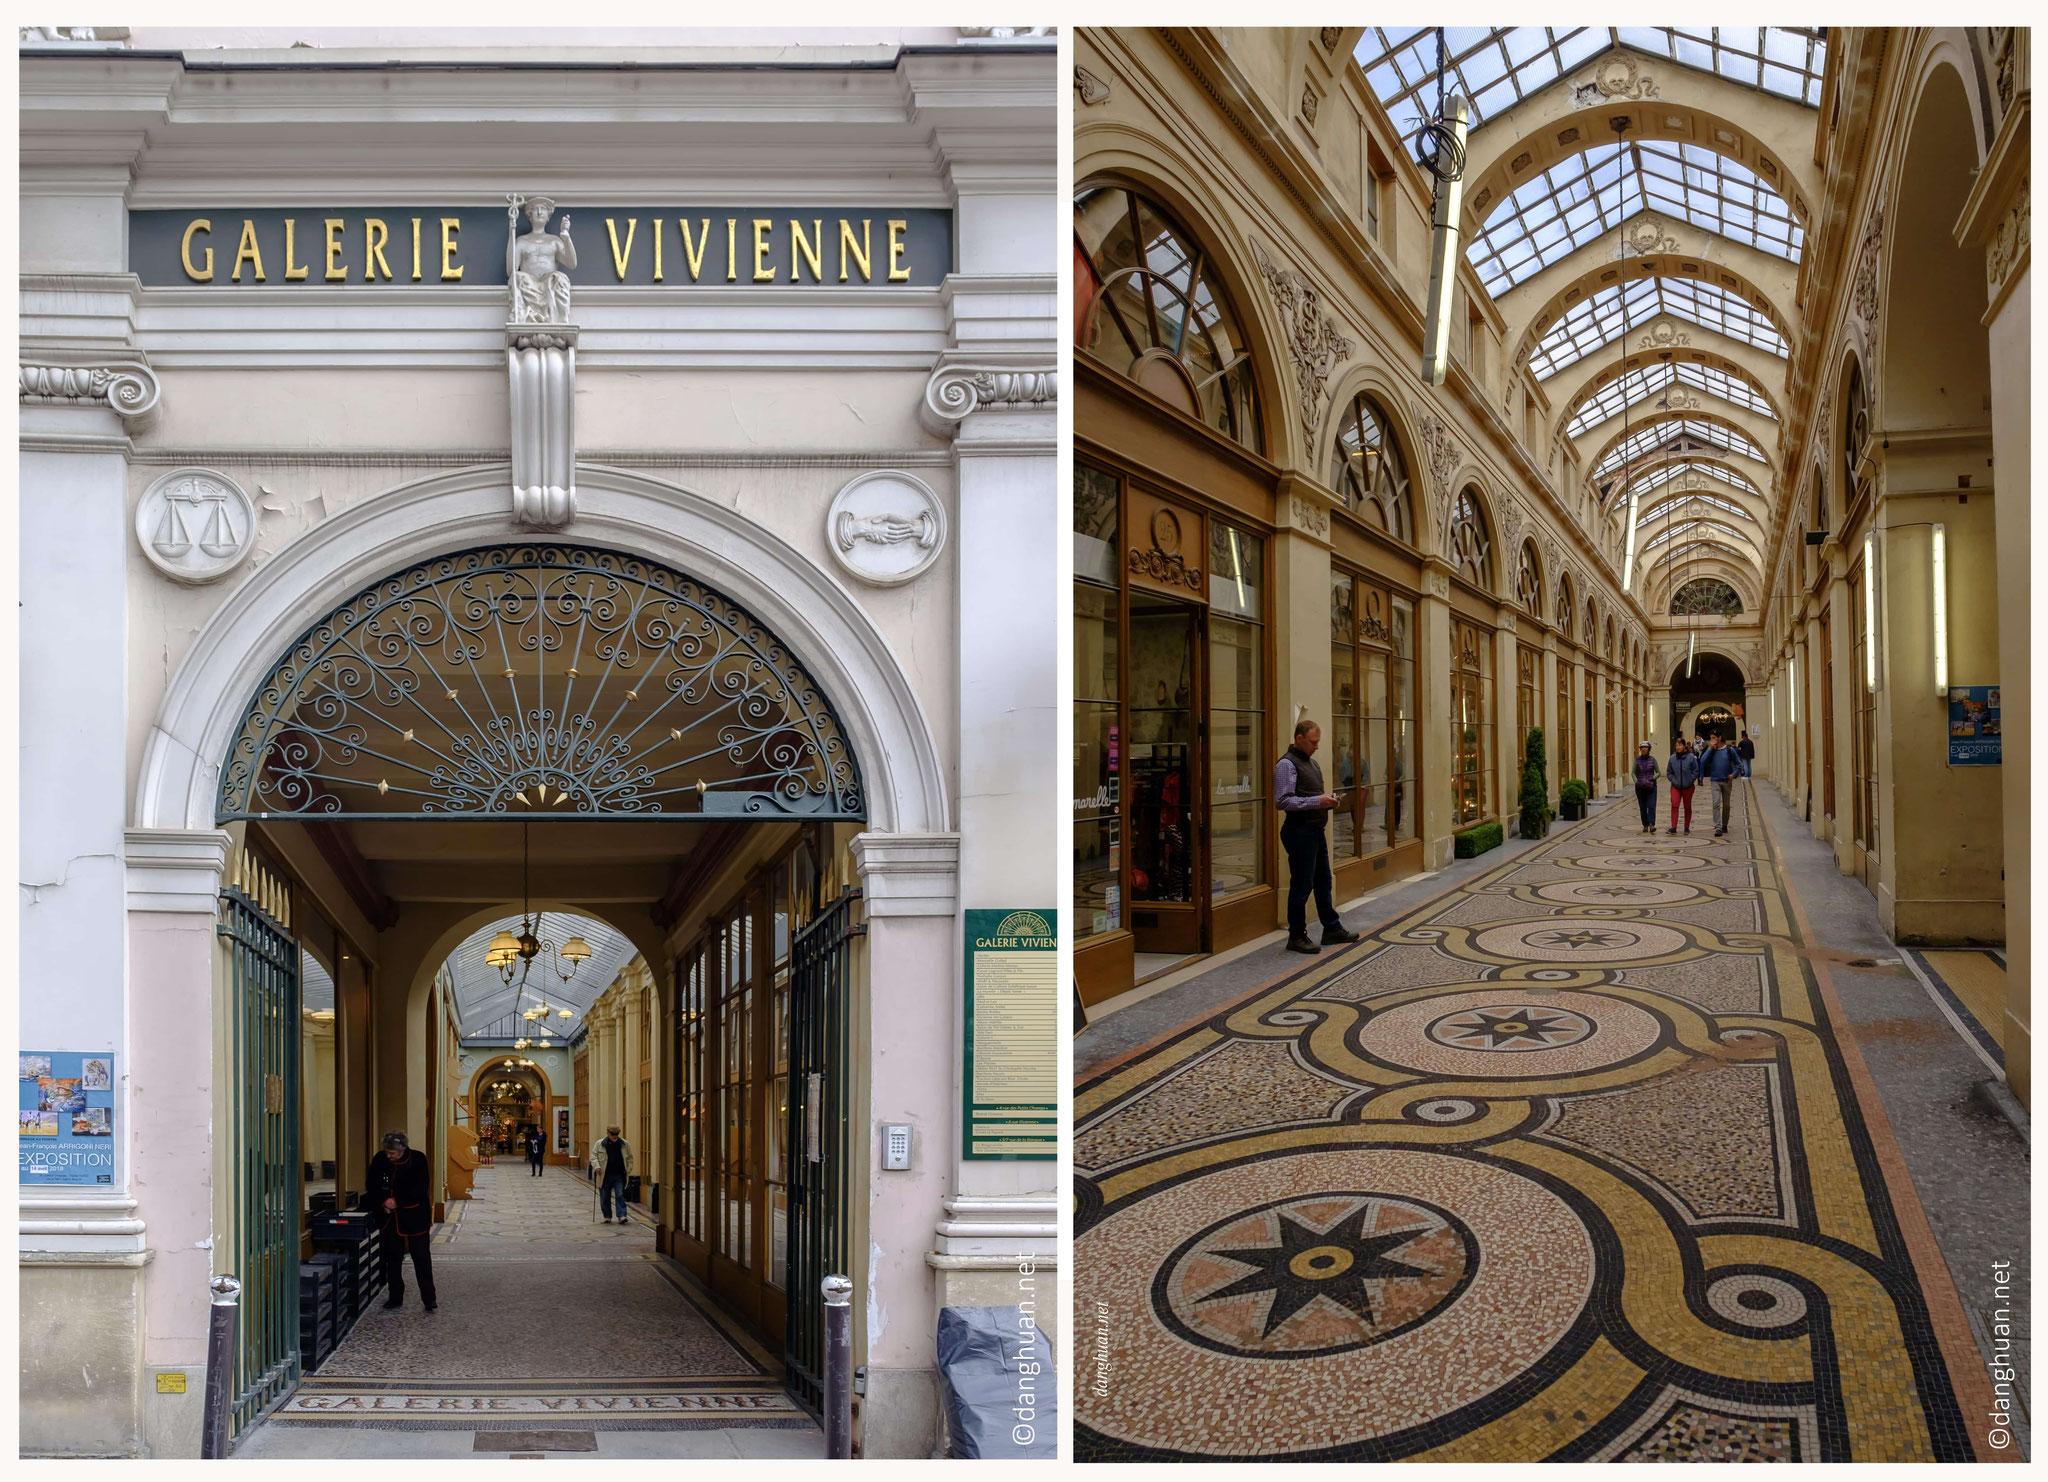 Galerie Vivienne : construite en 1823...